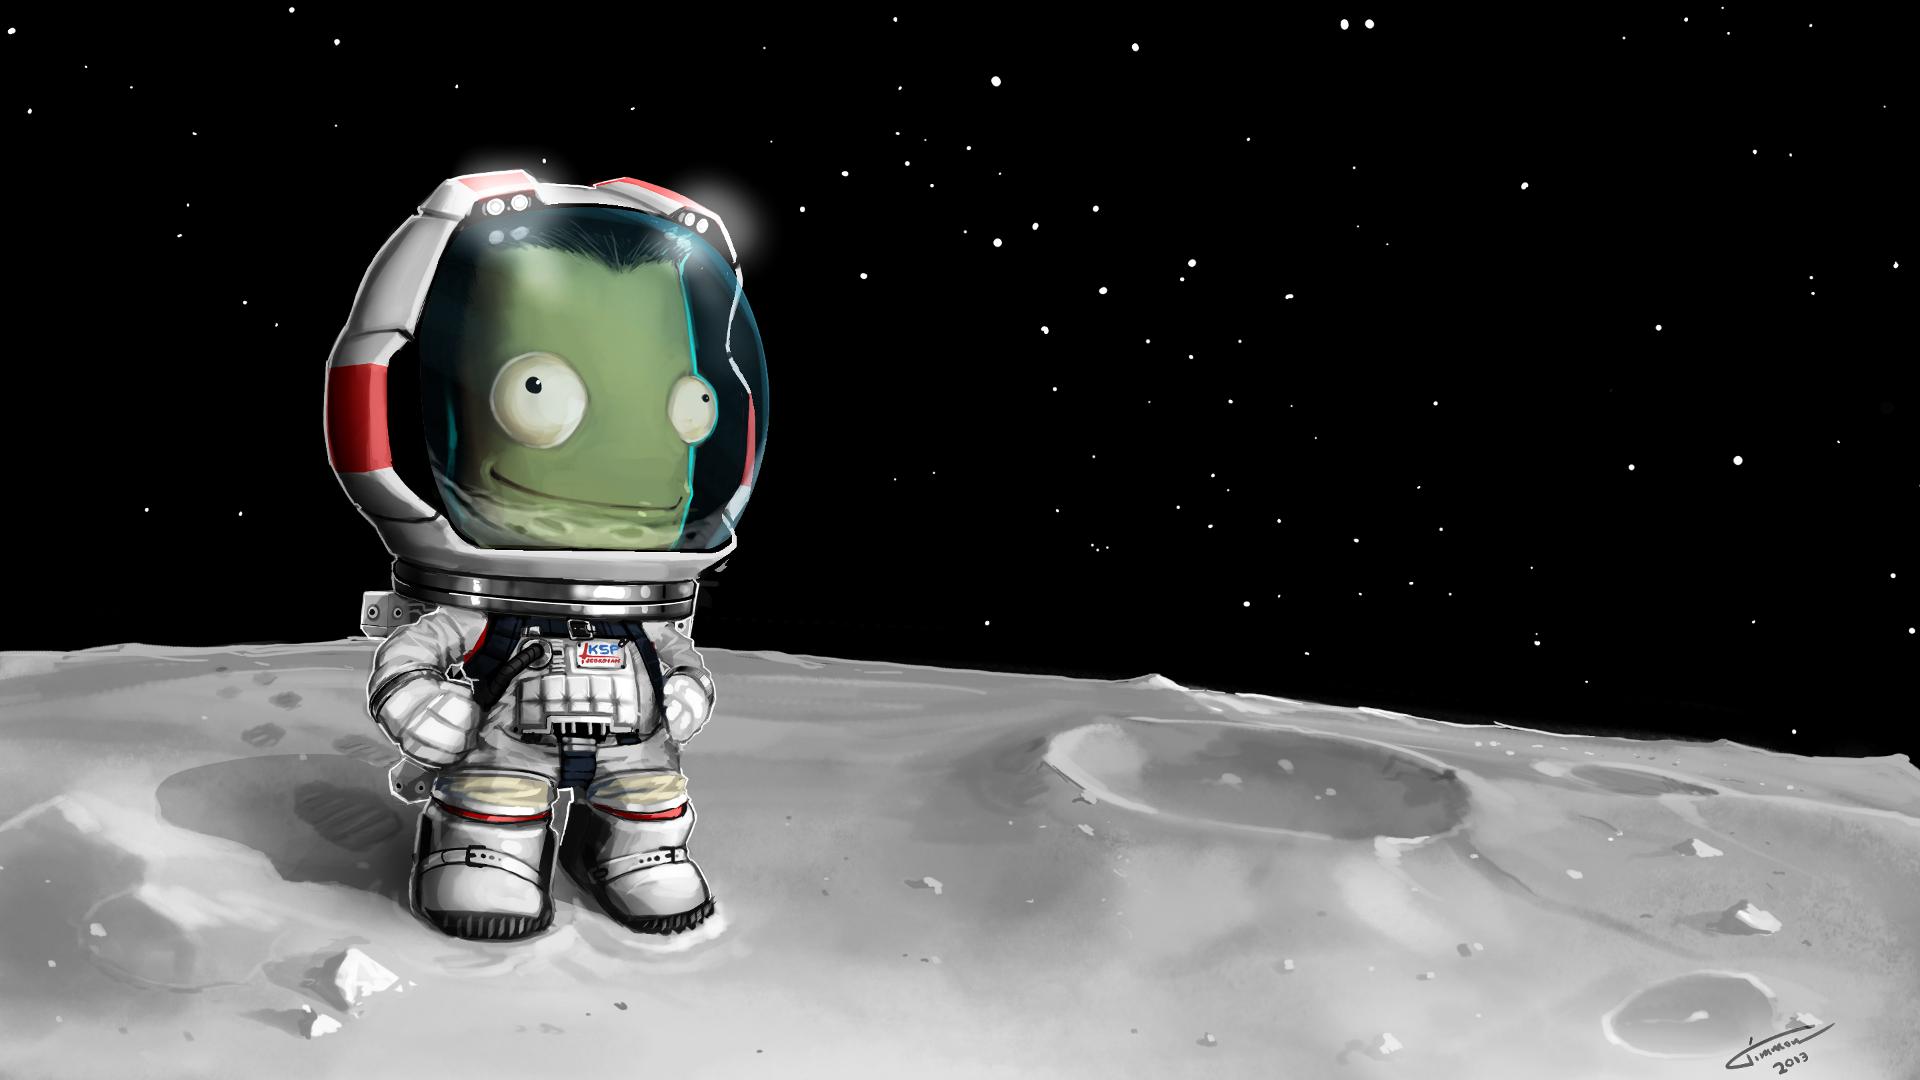 kerbal space program - photo #15